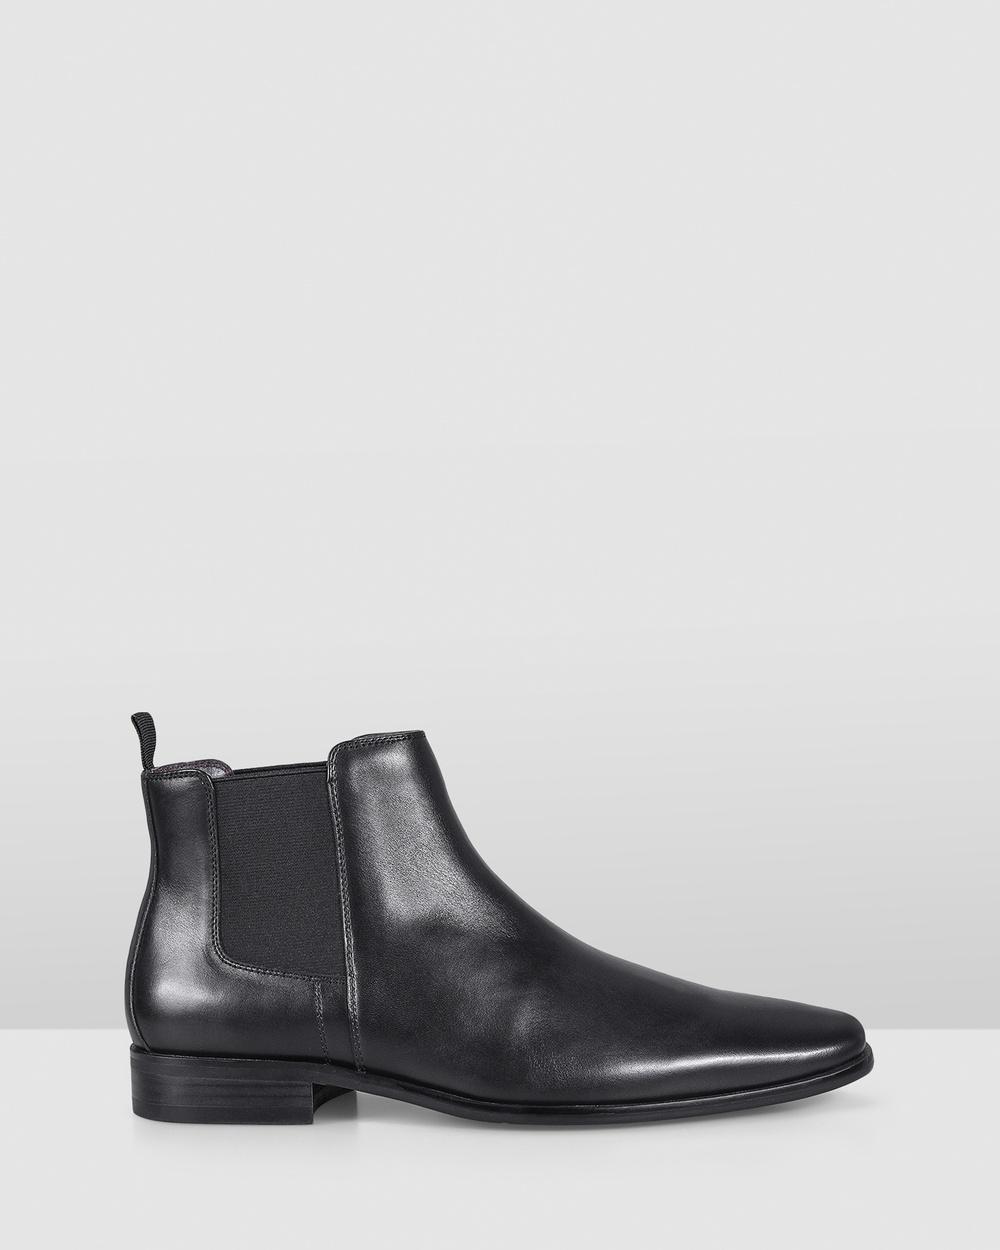 Julius Marlow Impart Boots Black